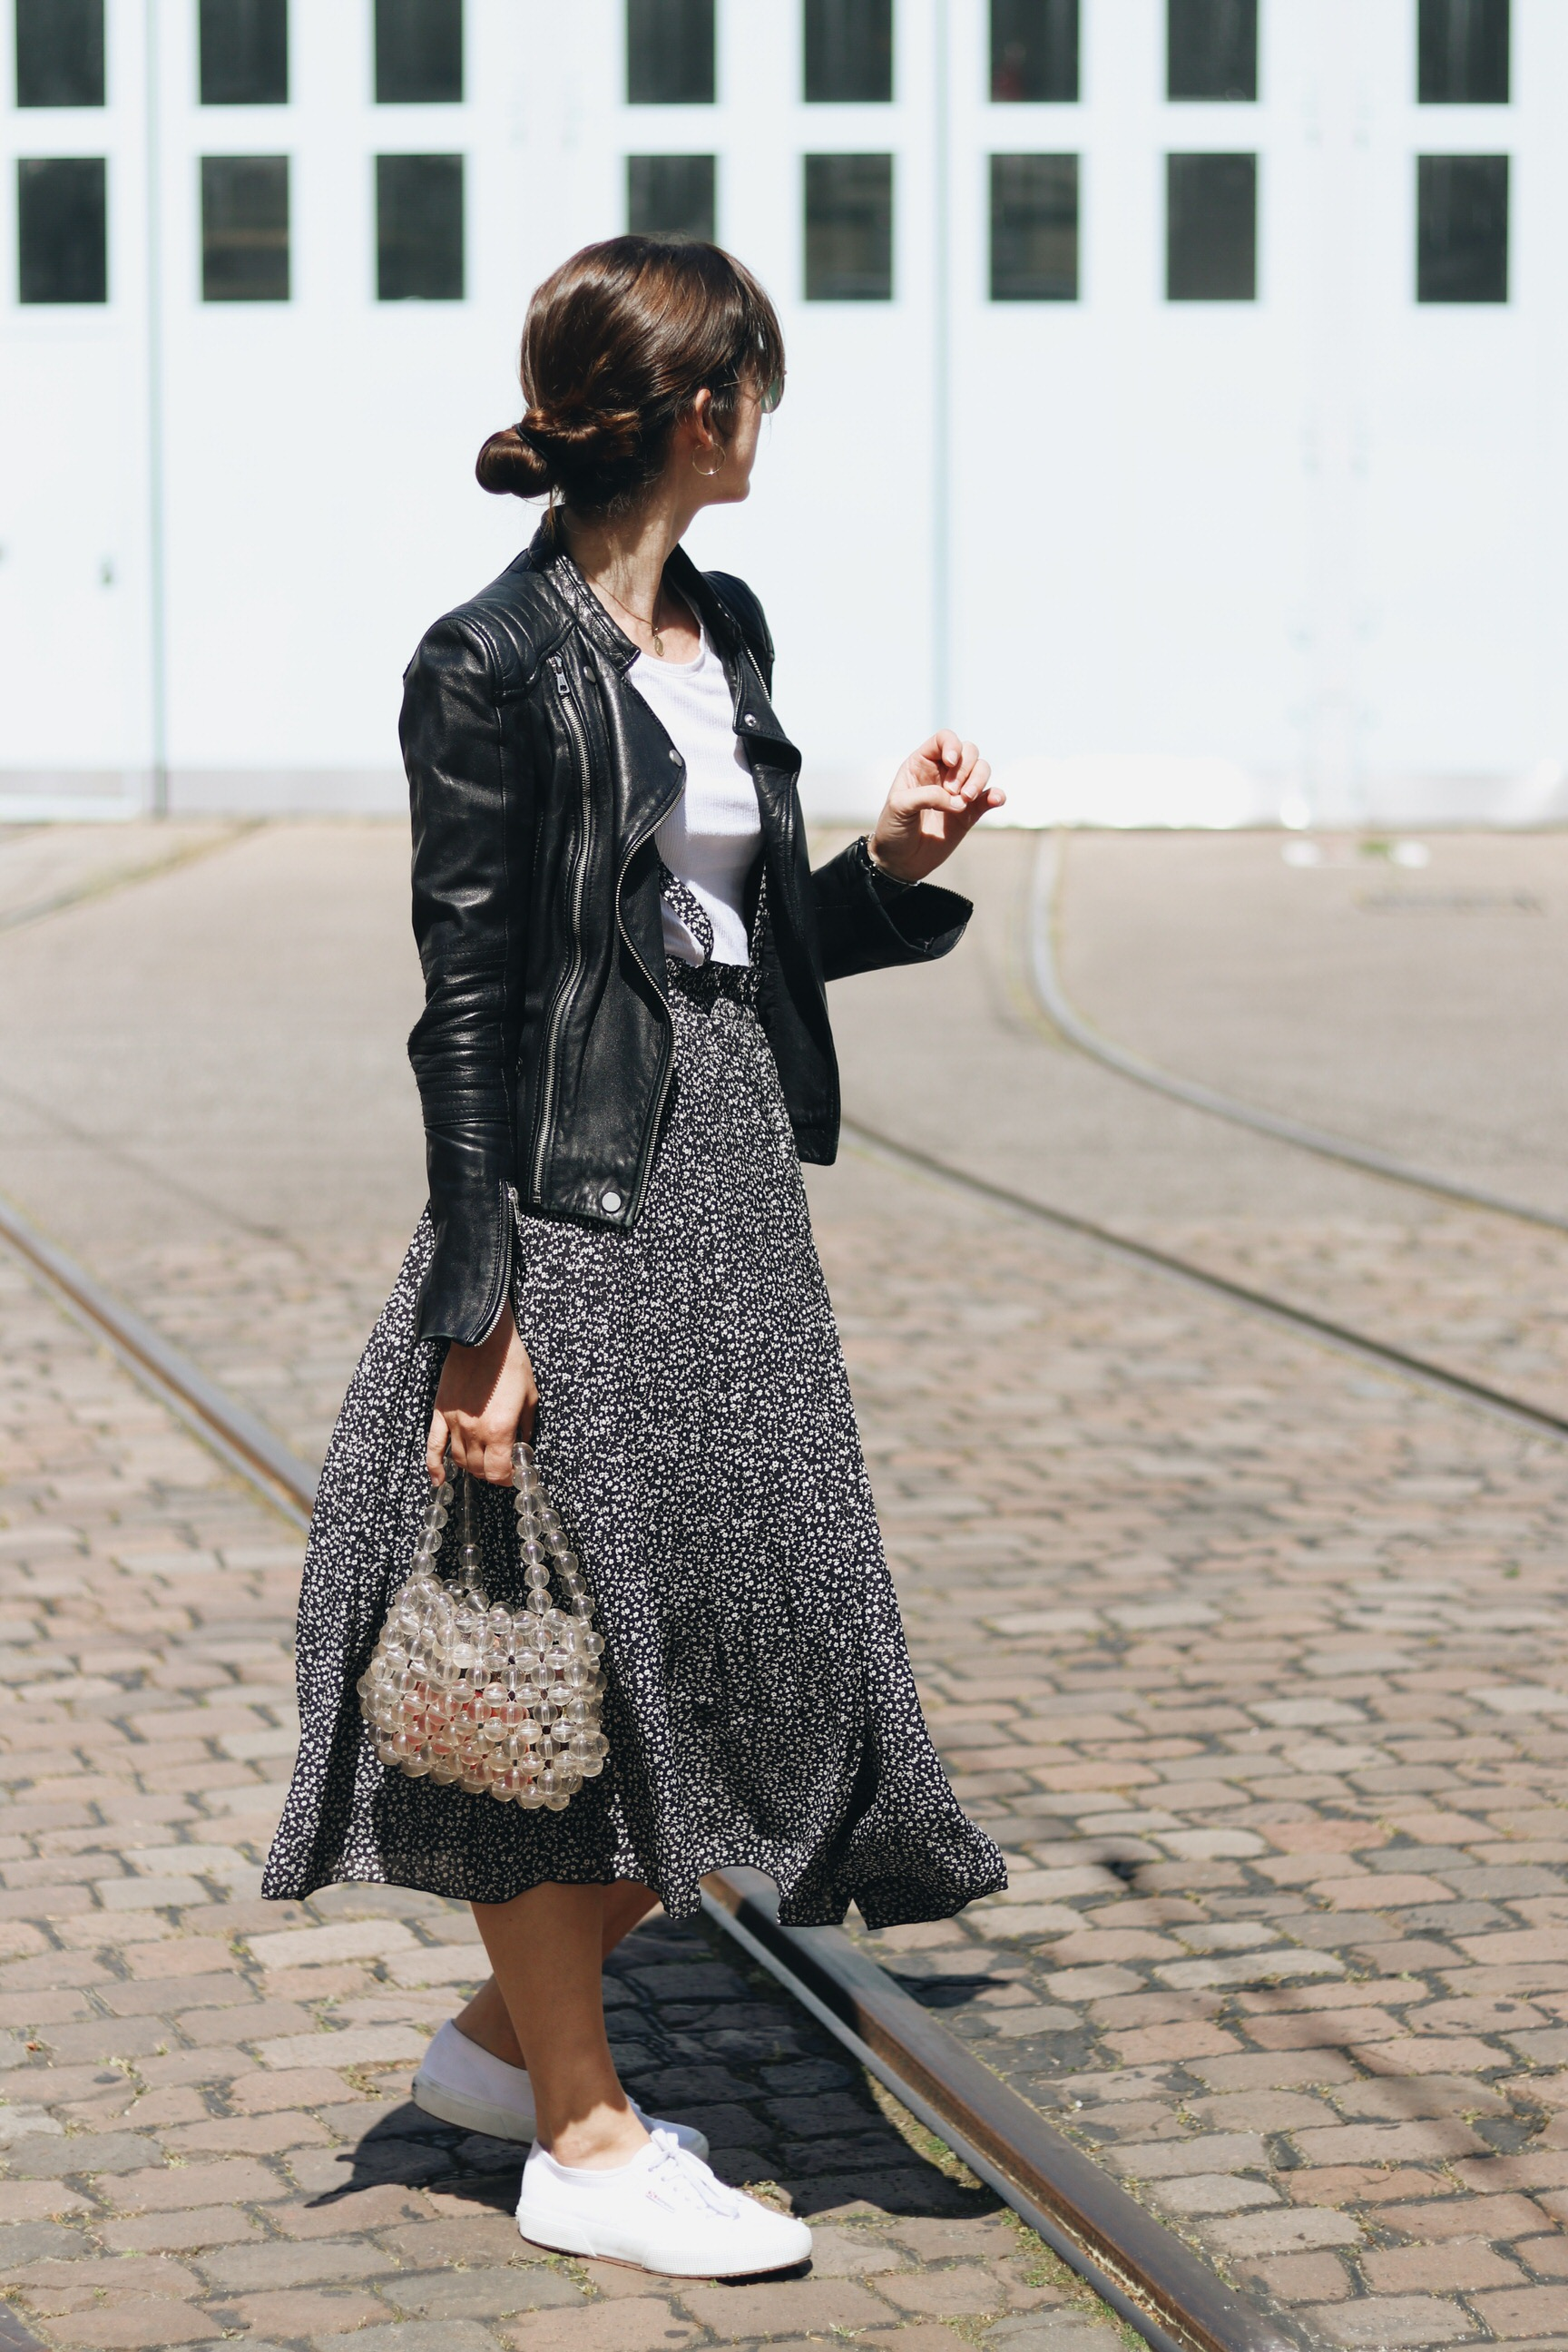 Blumenmuster Midirock Outfit Modebloggerin Perlentasche Taschentrends Neele